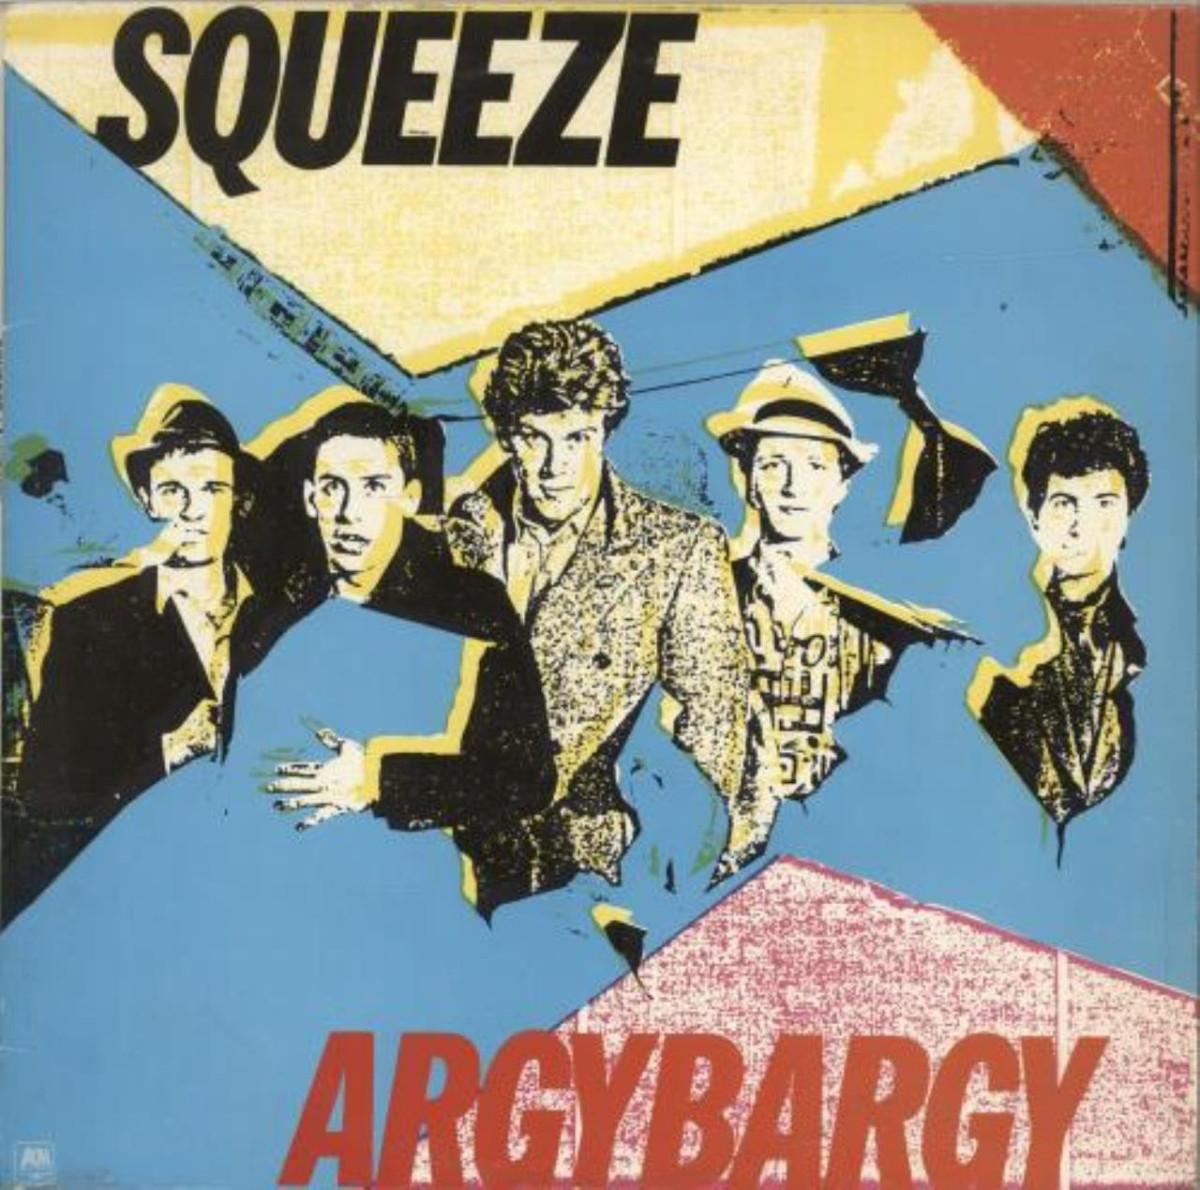 Squeeze, Argybargy